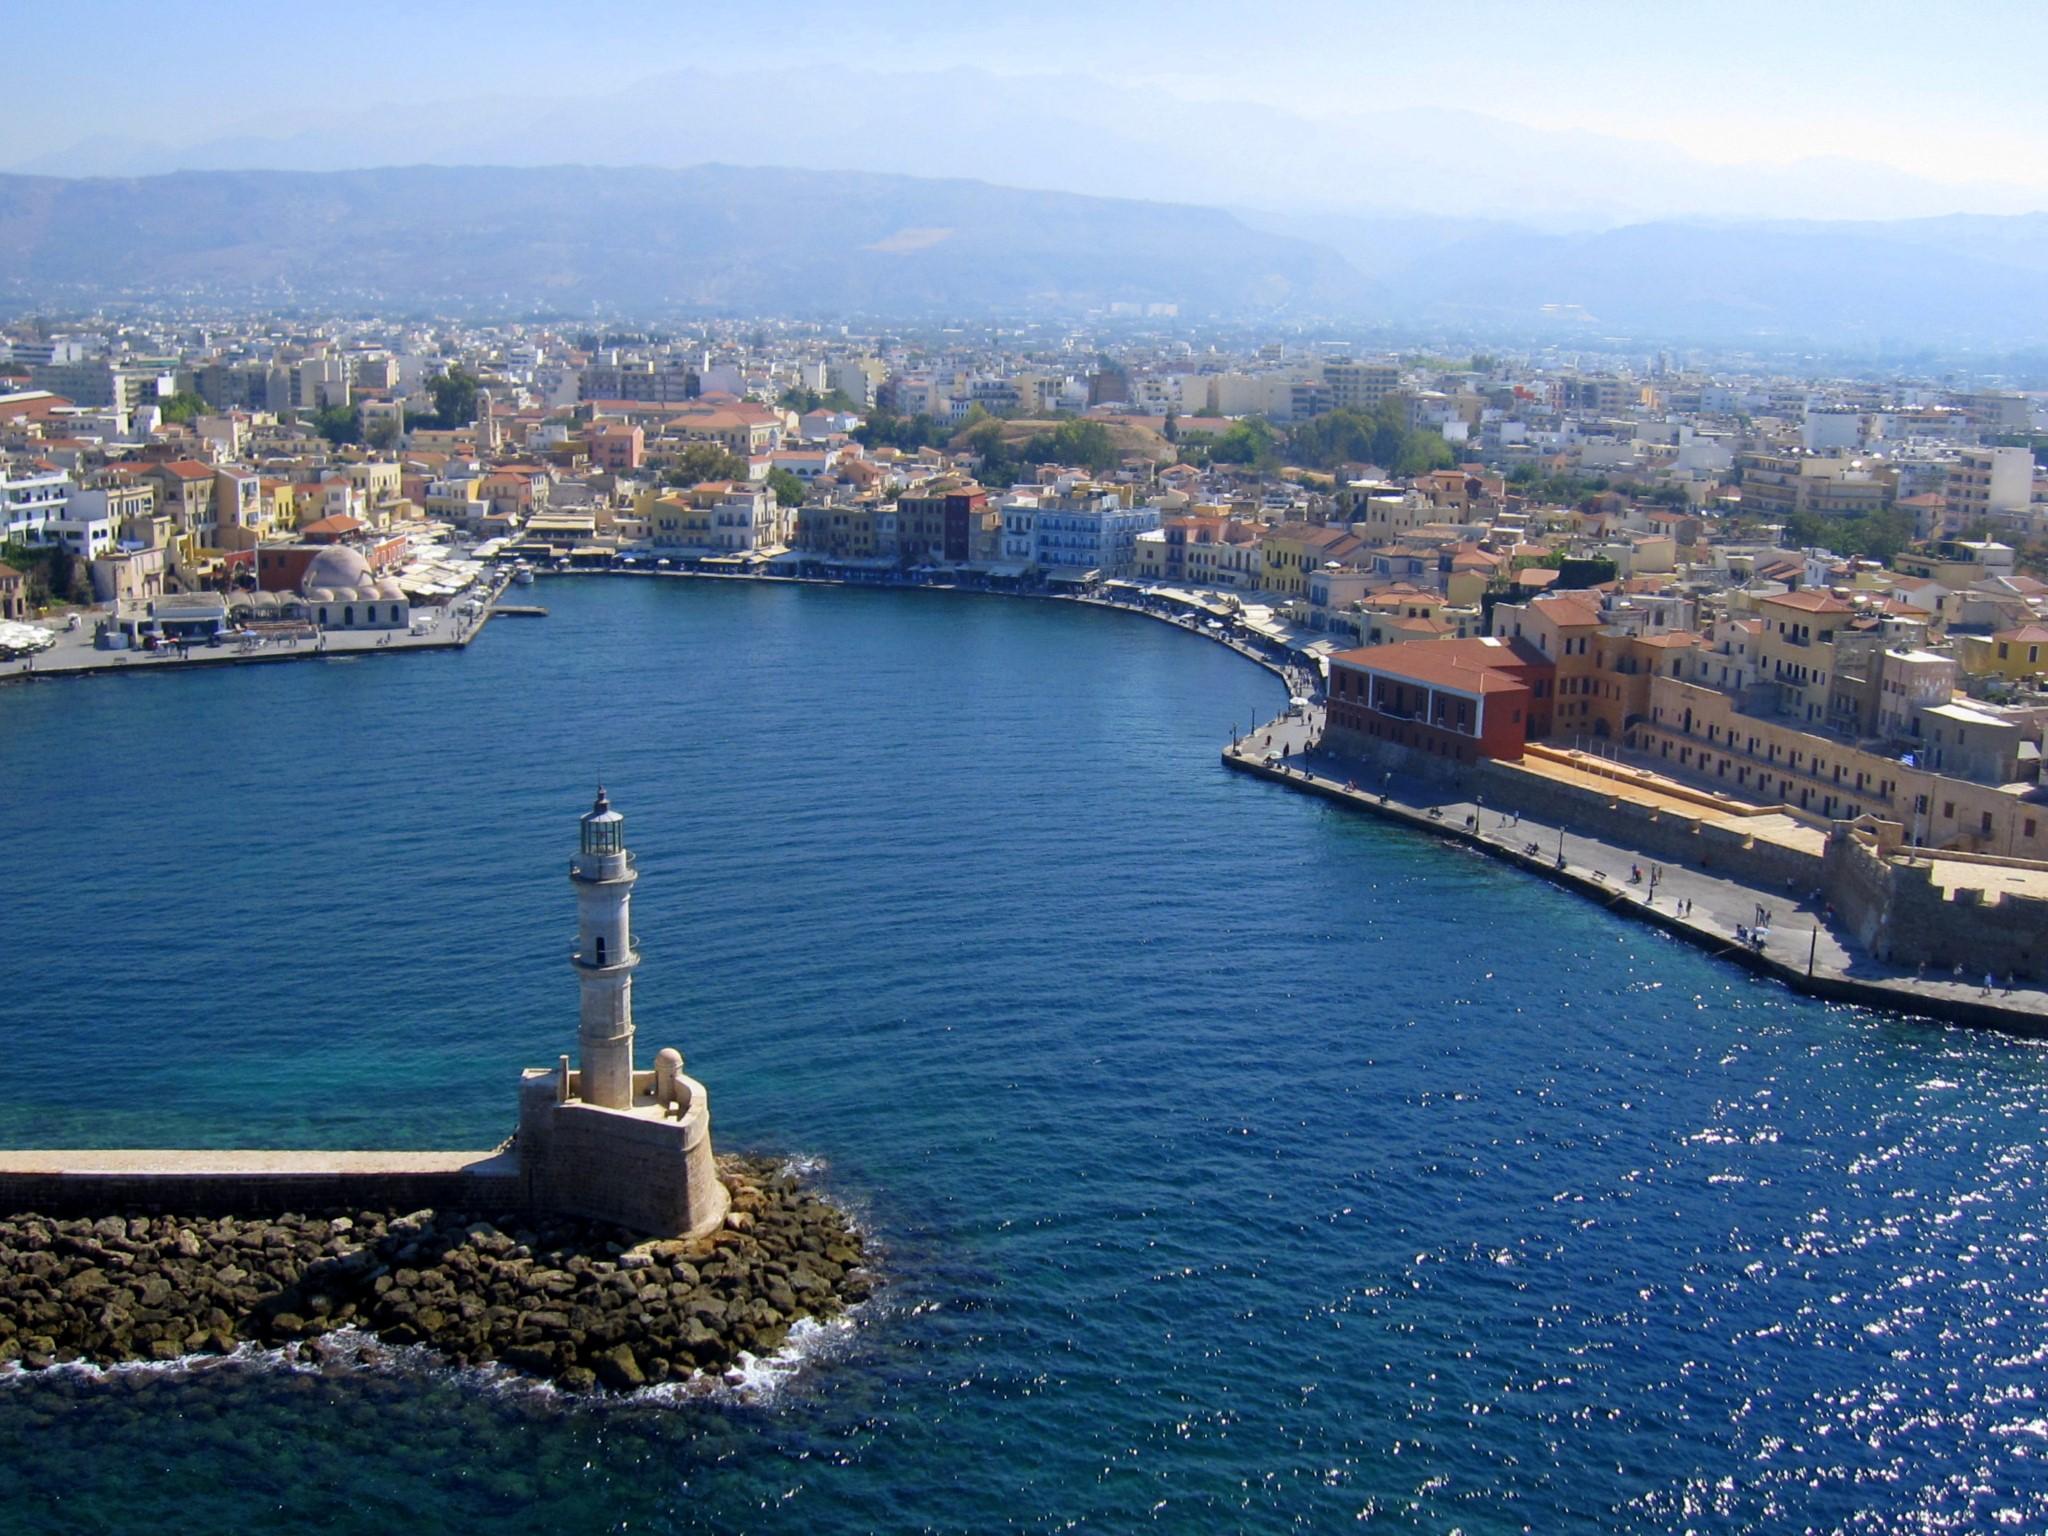 St. Nicholas Images >> Chania Lighthouse - Travel Guide for Island Crete, Greece